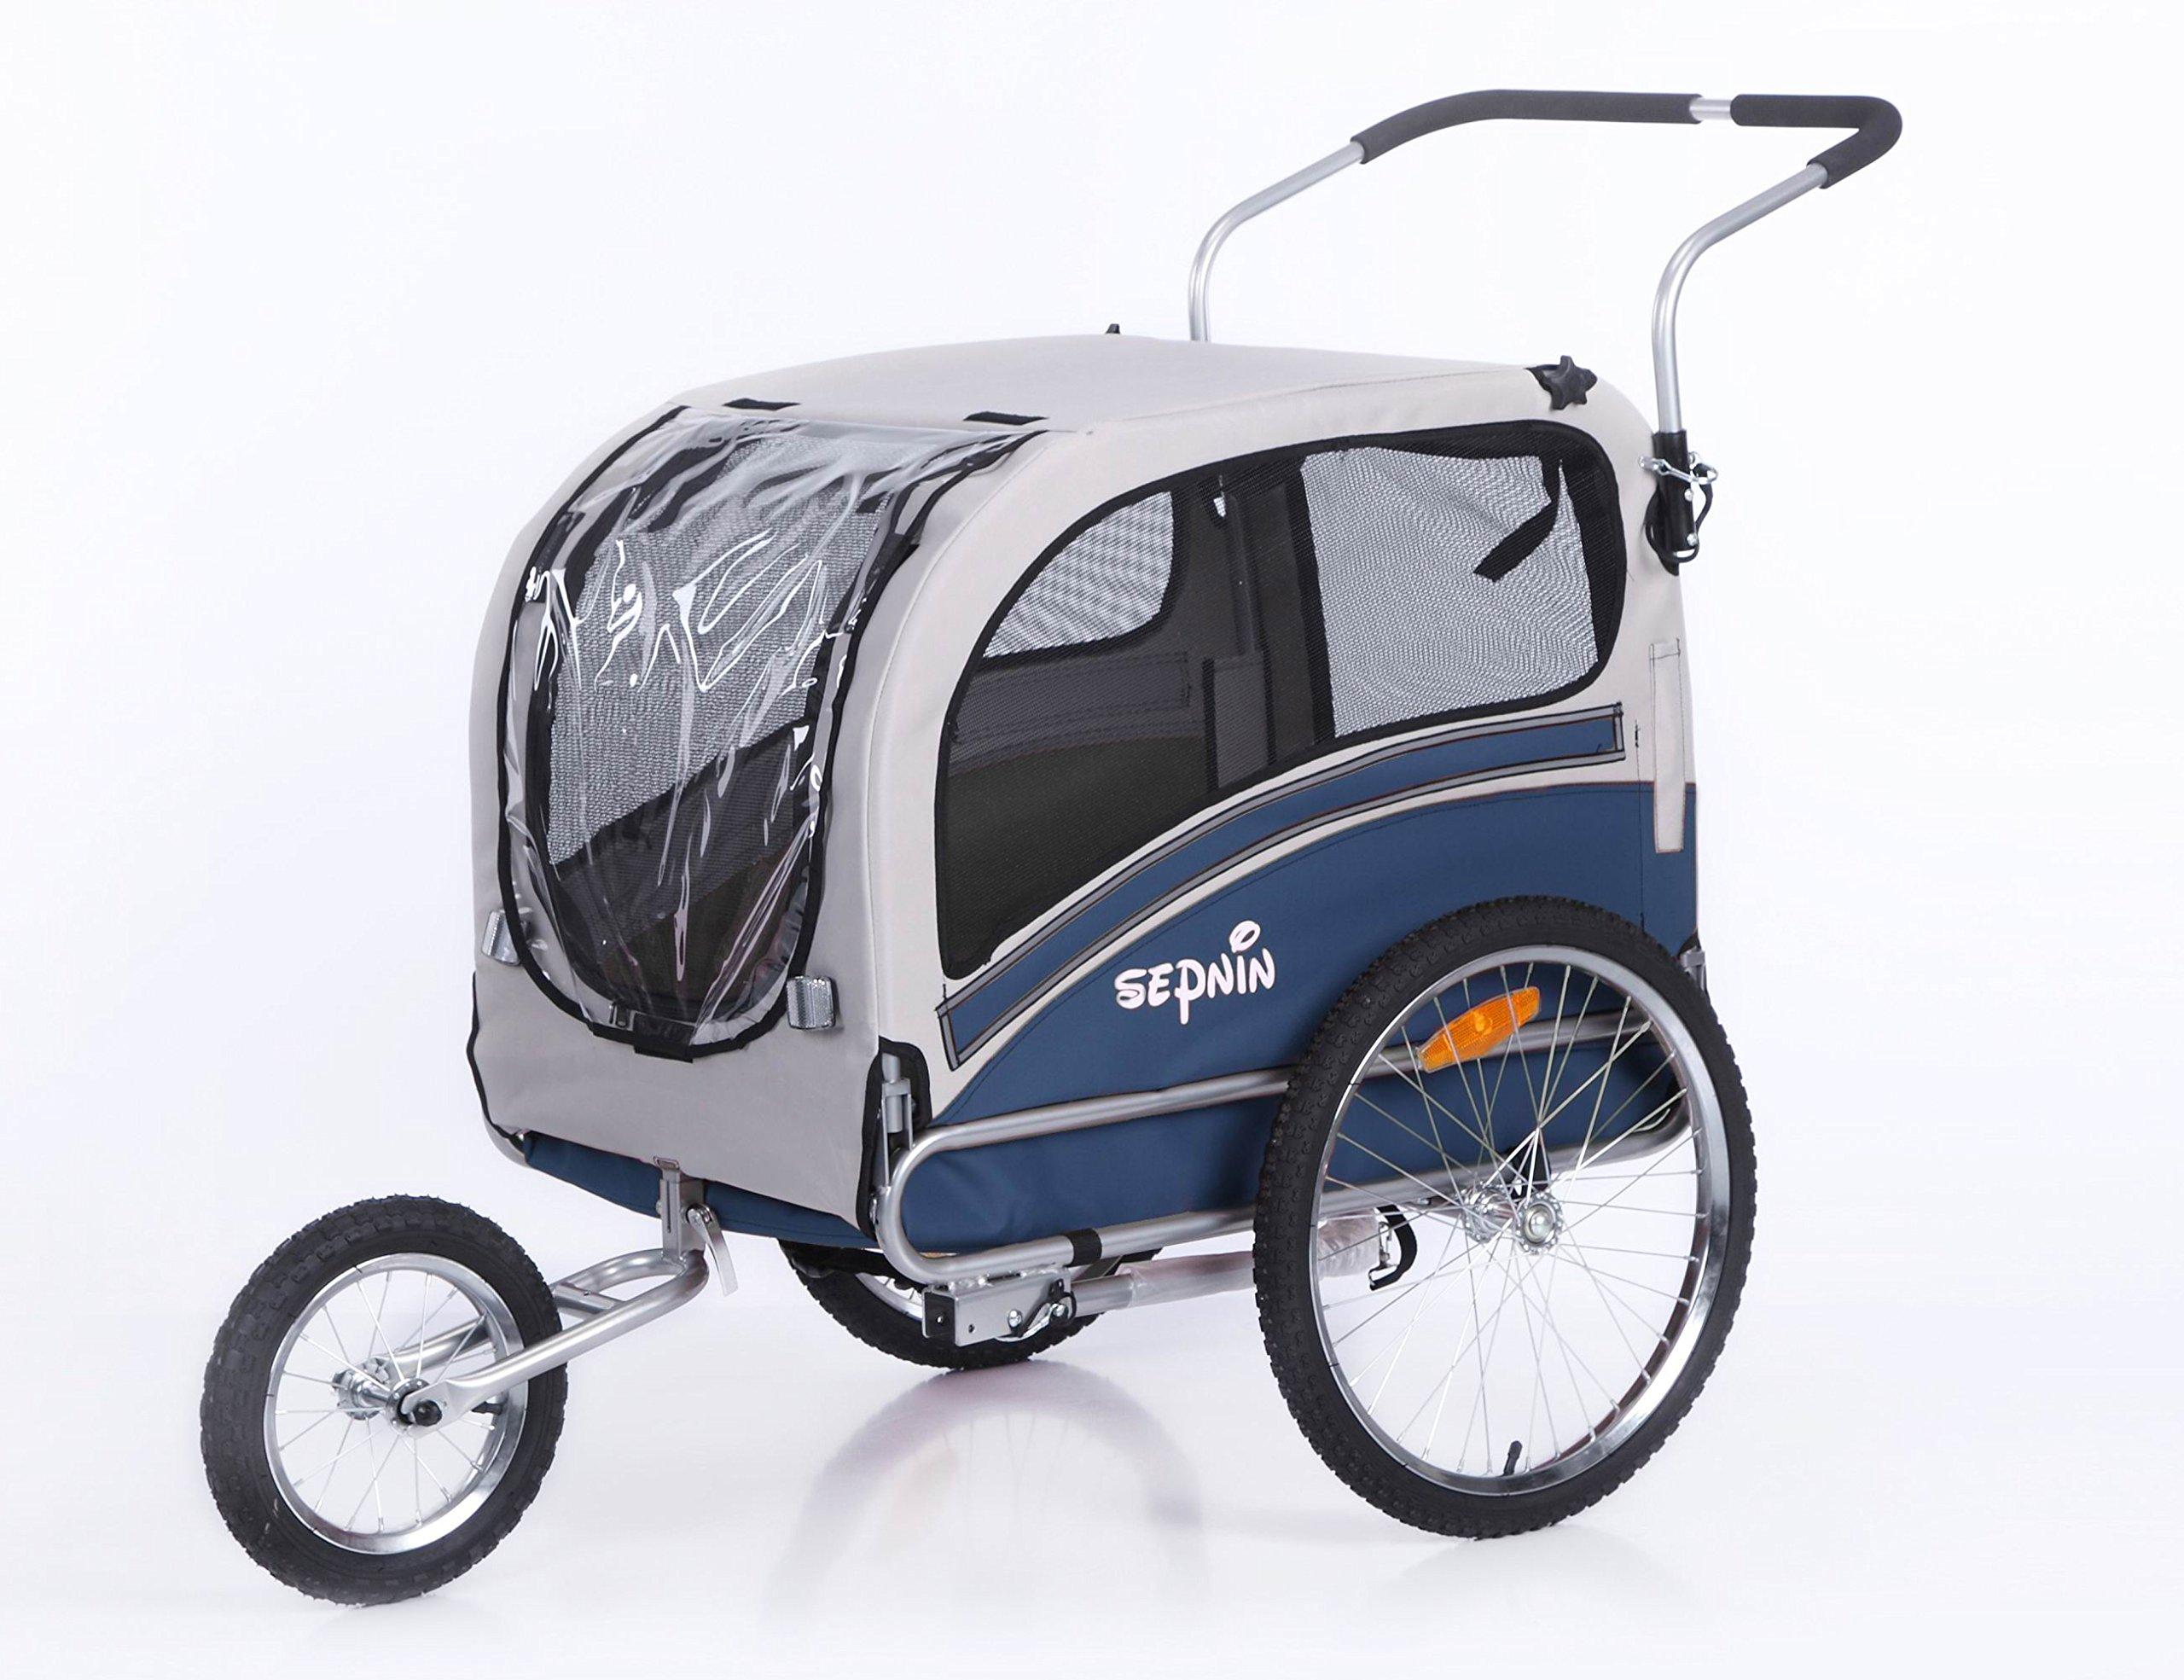 Sepnine Pet Fog Bike Trailer, Blue/Grey